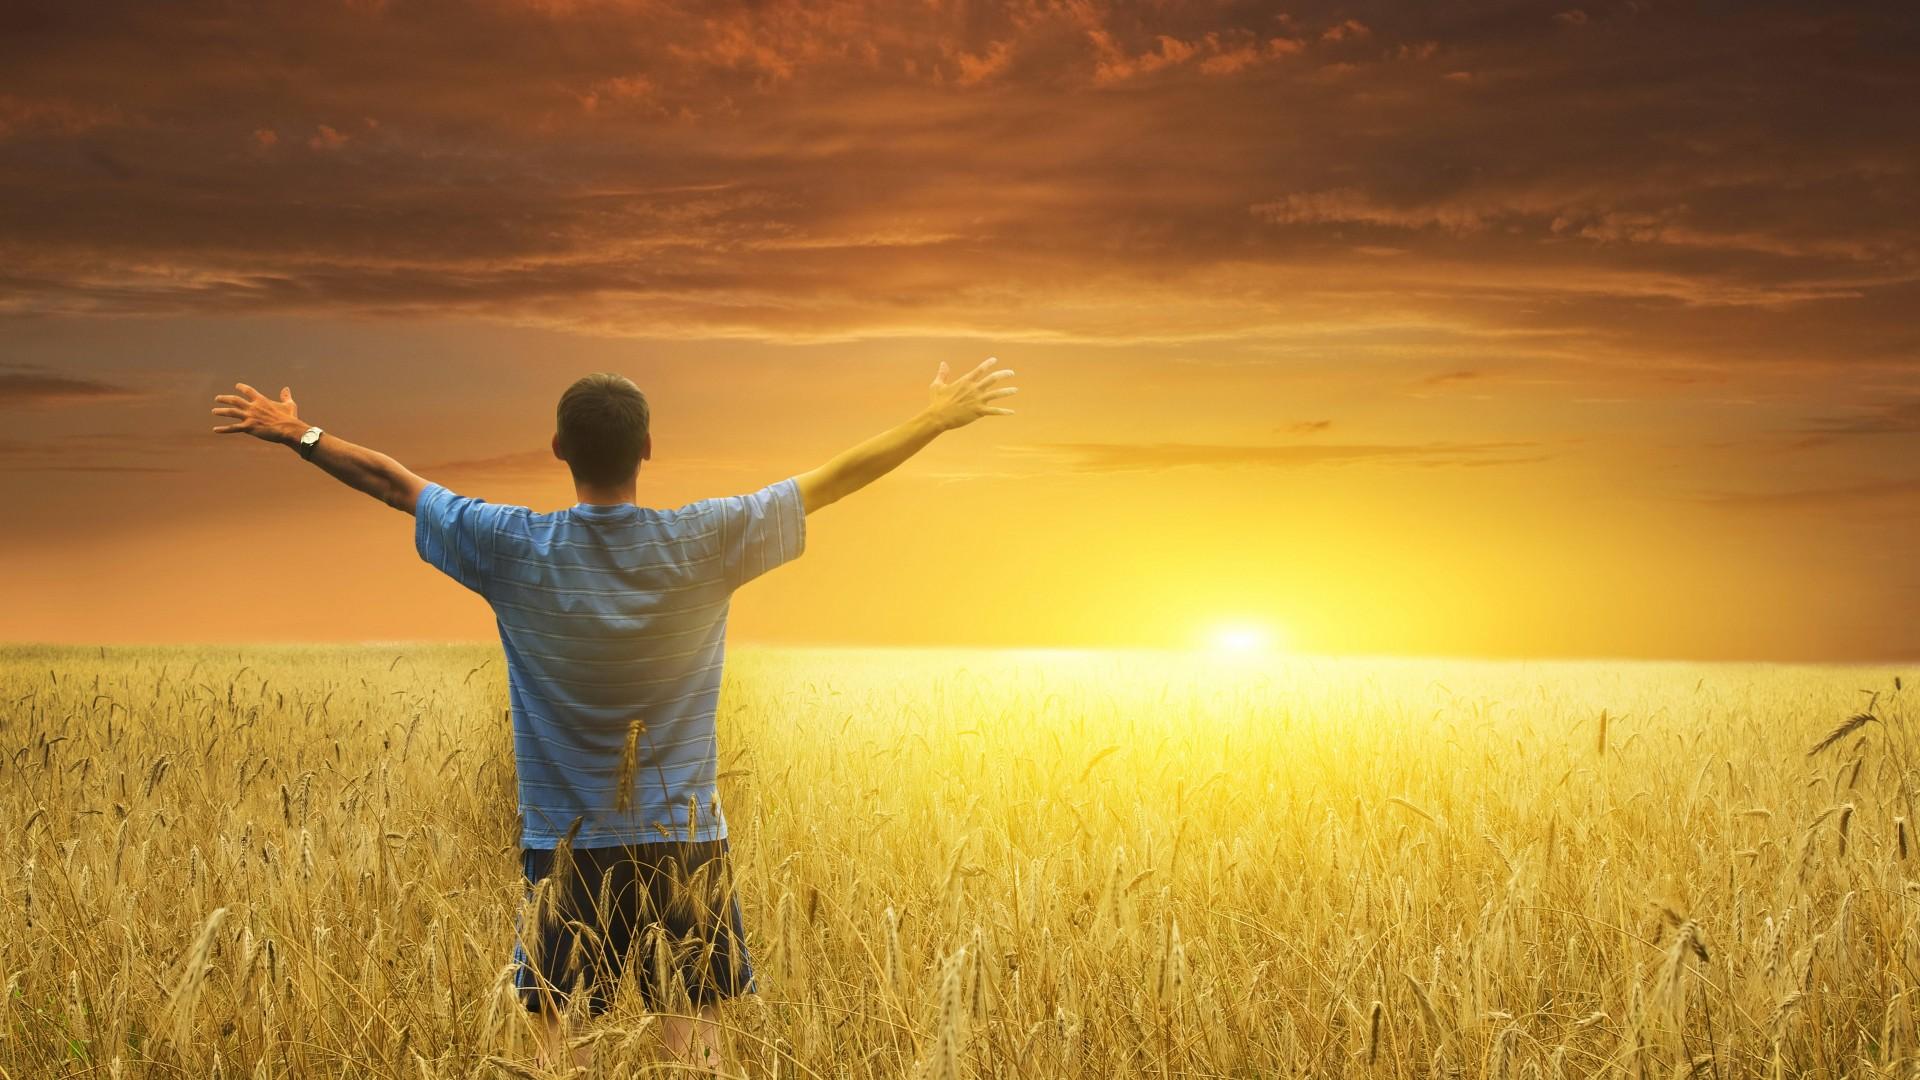 men_males_mood_sunset_sunrise_landscapes_fields_grass_wheat_sky_1920x1080